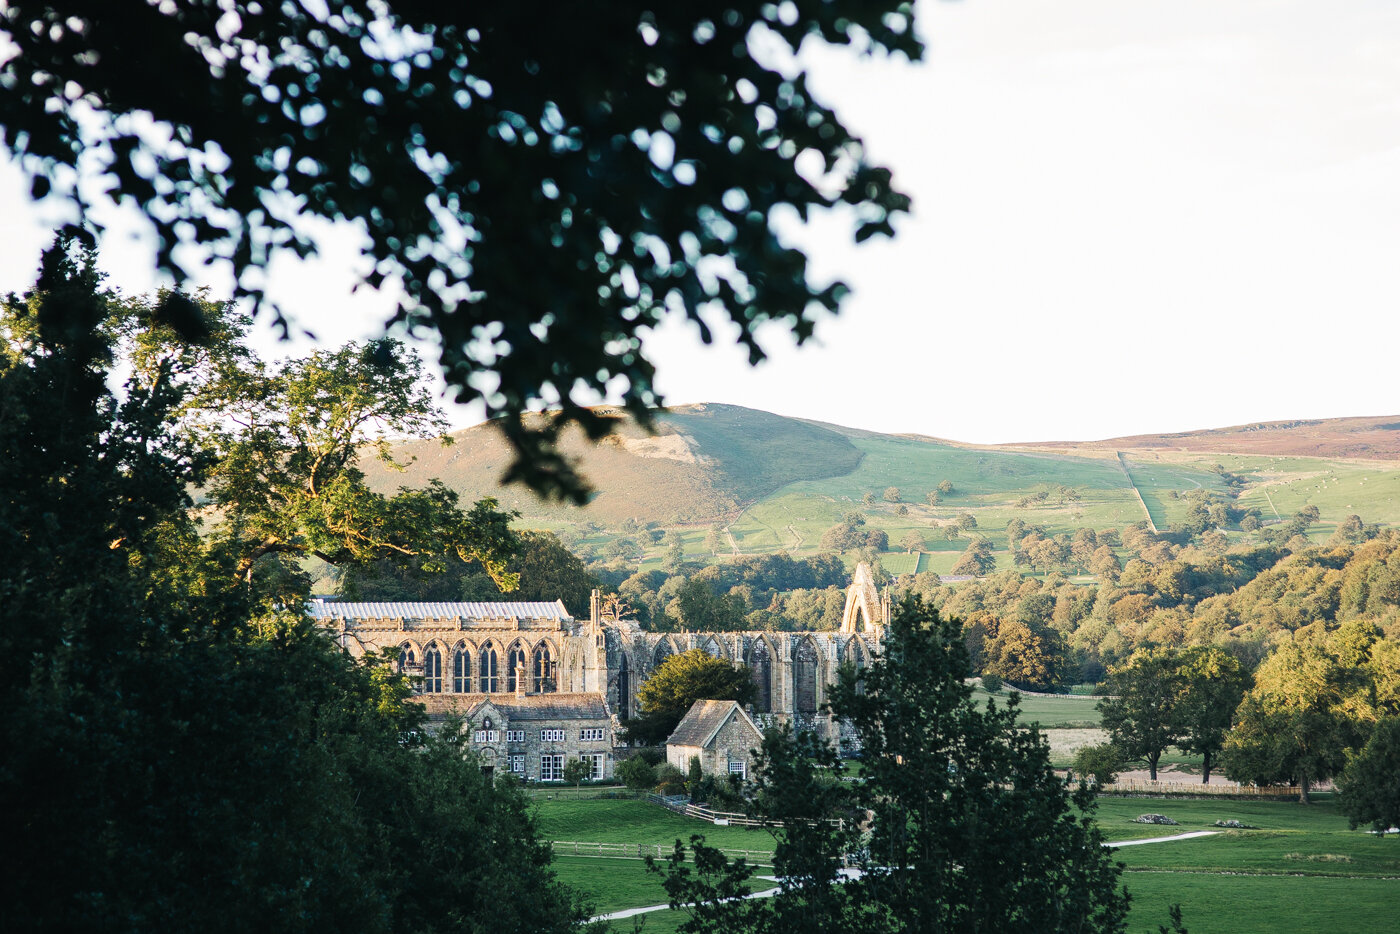 tithe-barn-bolton-abbey-north-yorkshire-cripps-wedding-photographer-creative-0053.jpg